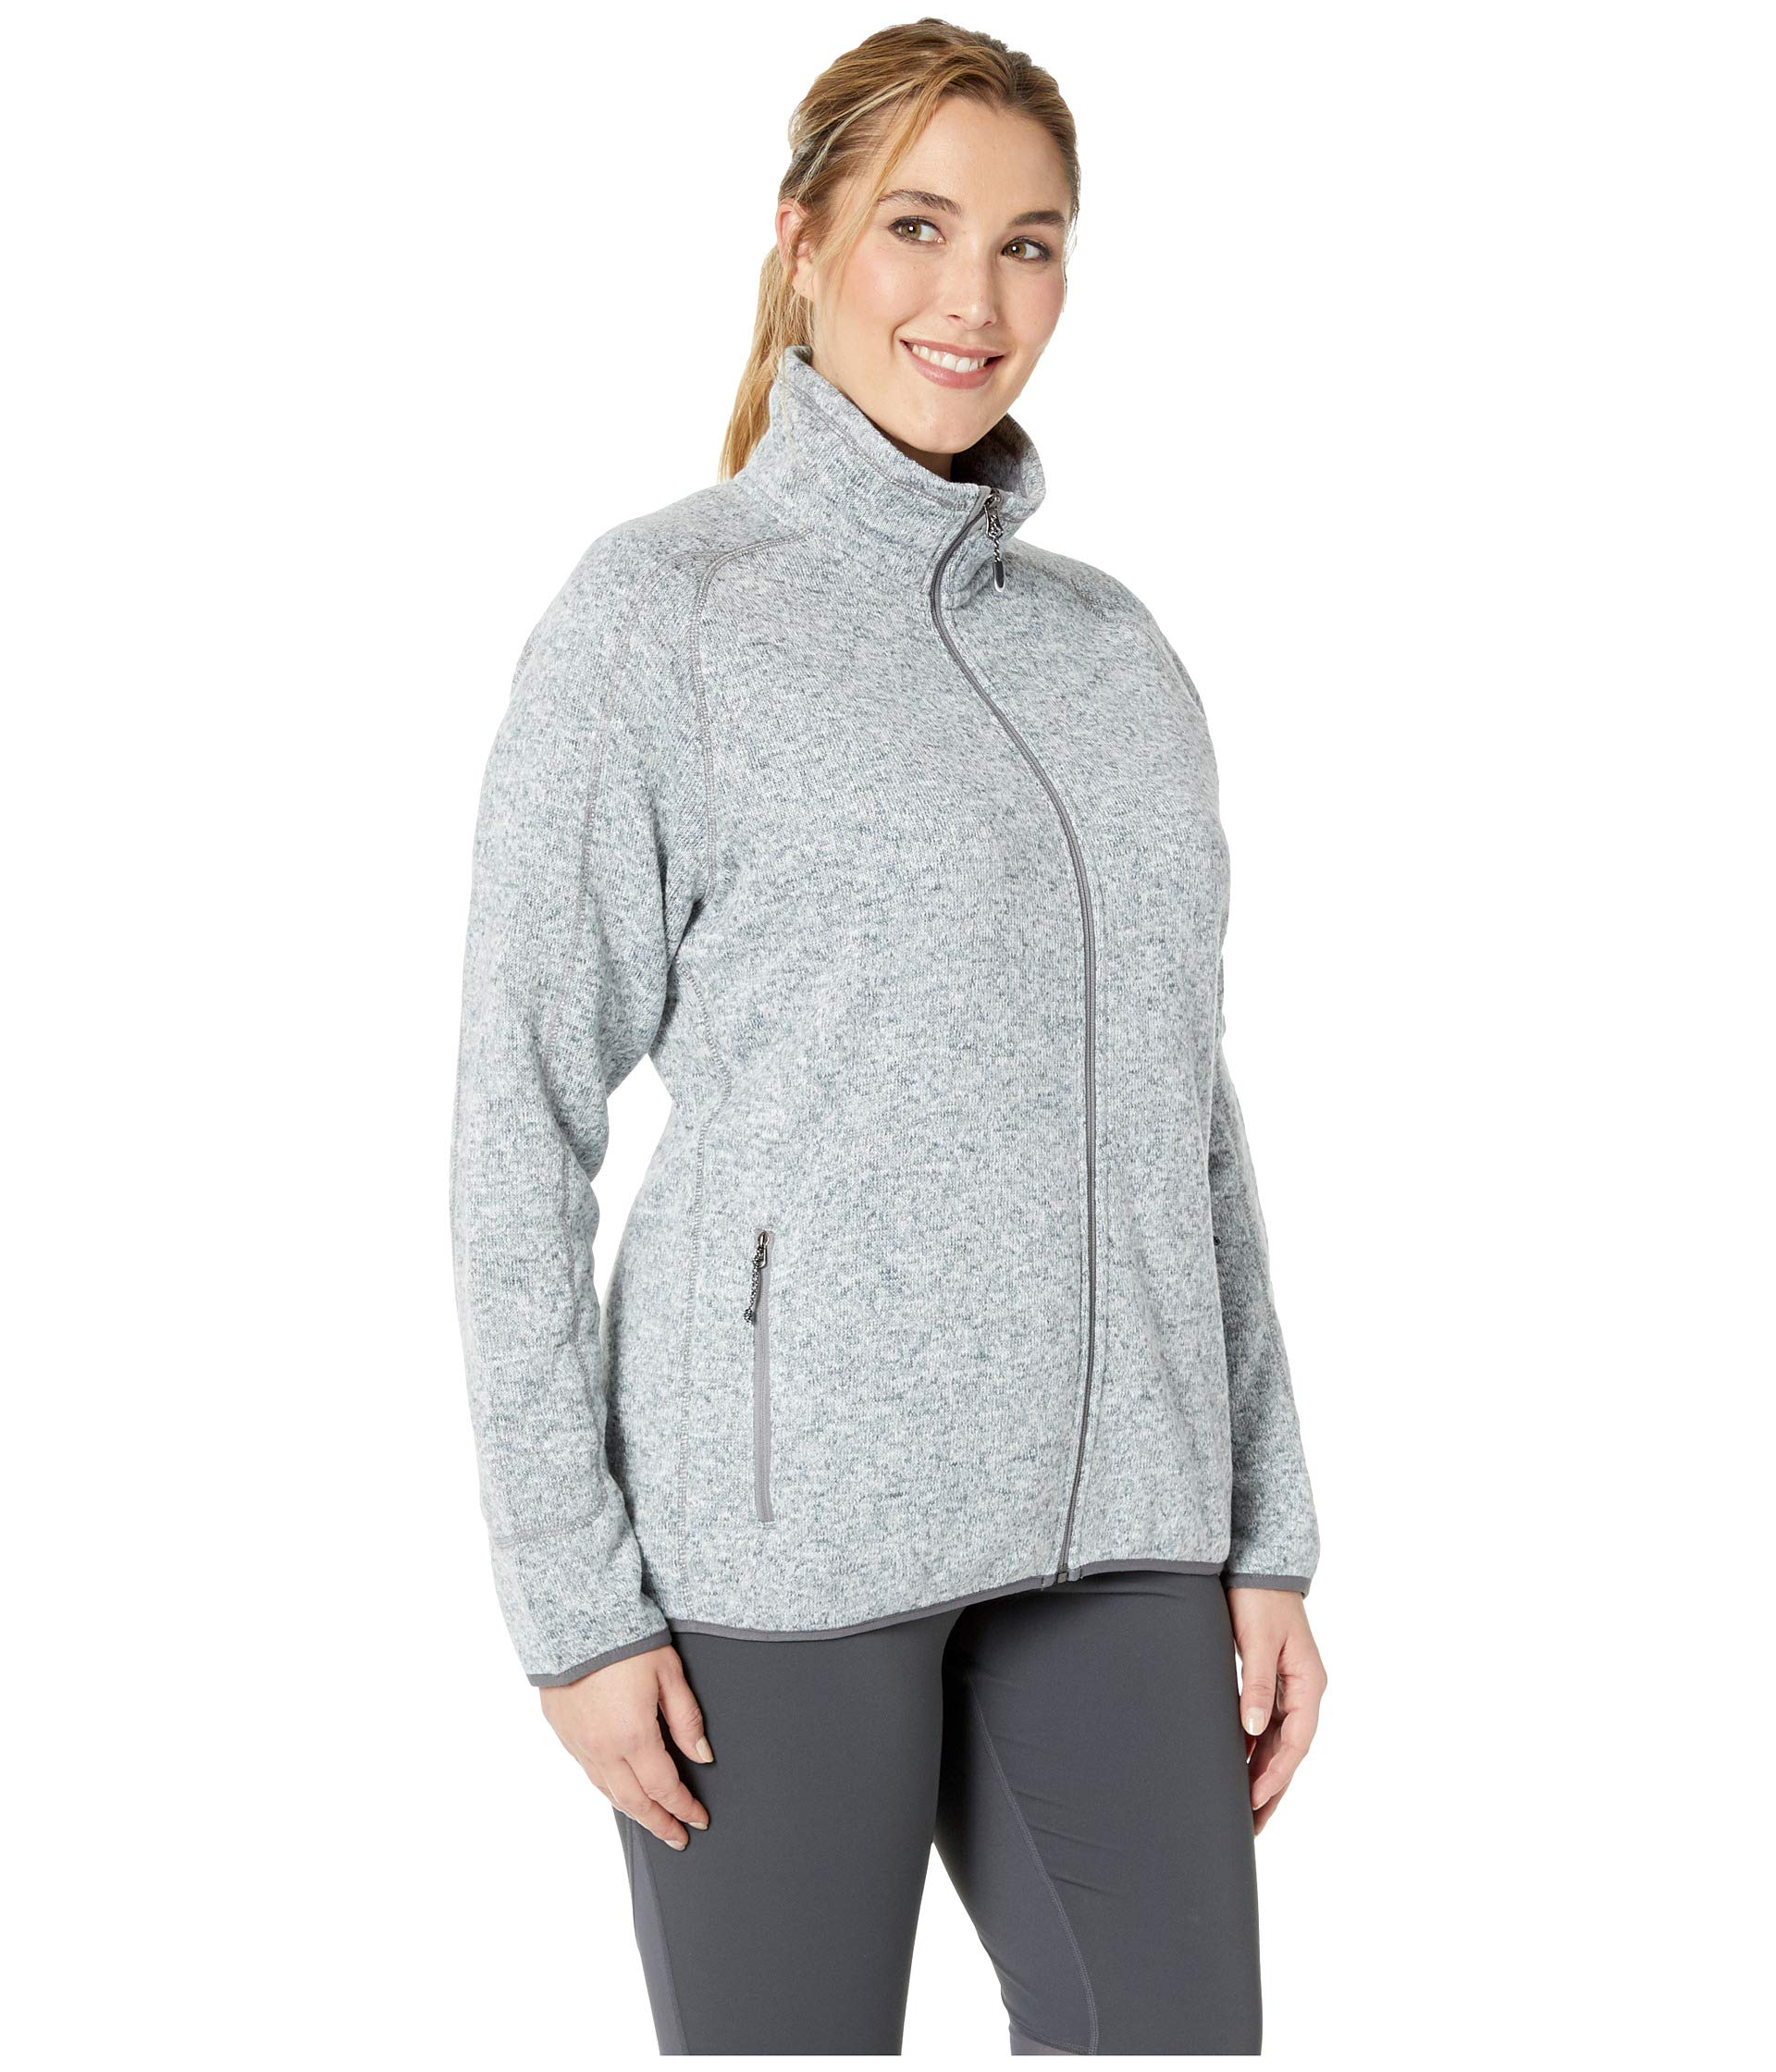 Zip Full Sweater Jacket Heather Fleece Sierra Gray Size Plus White Xavpq